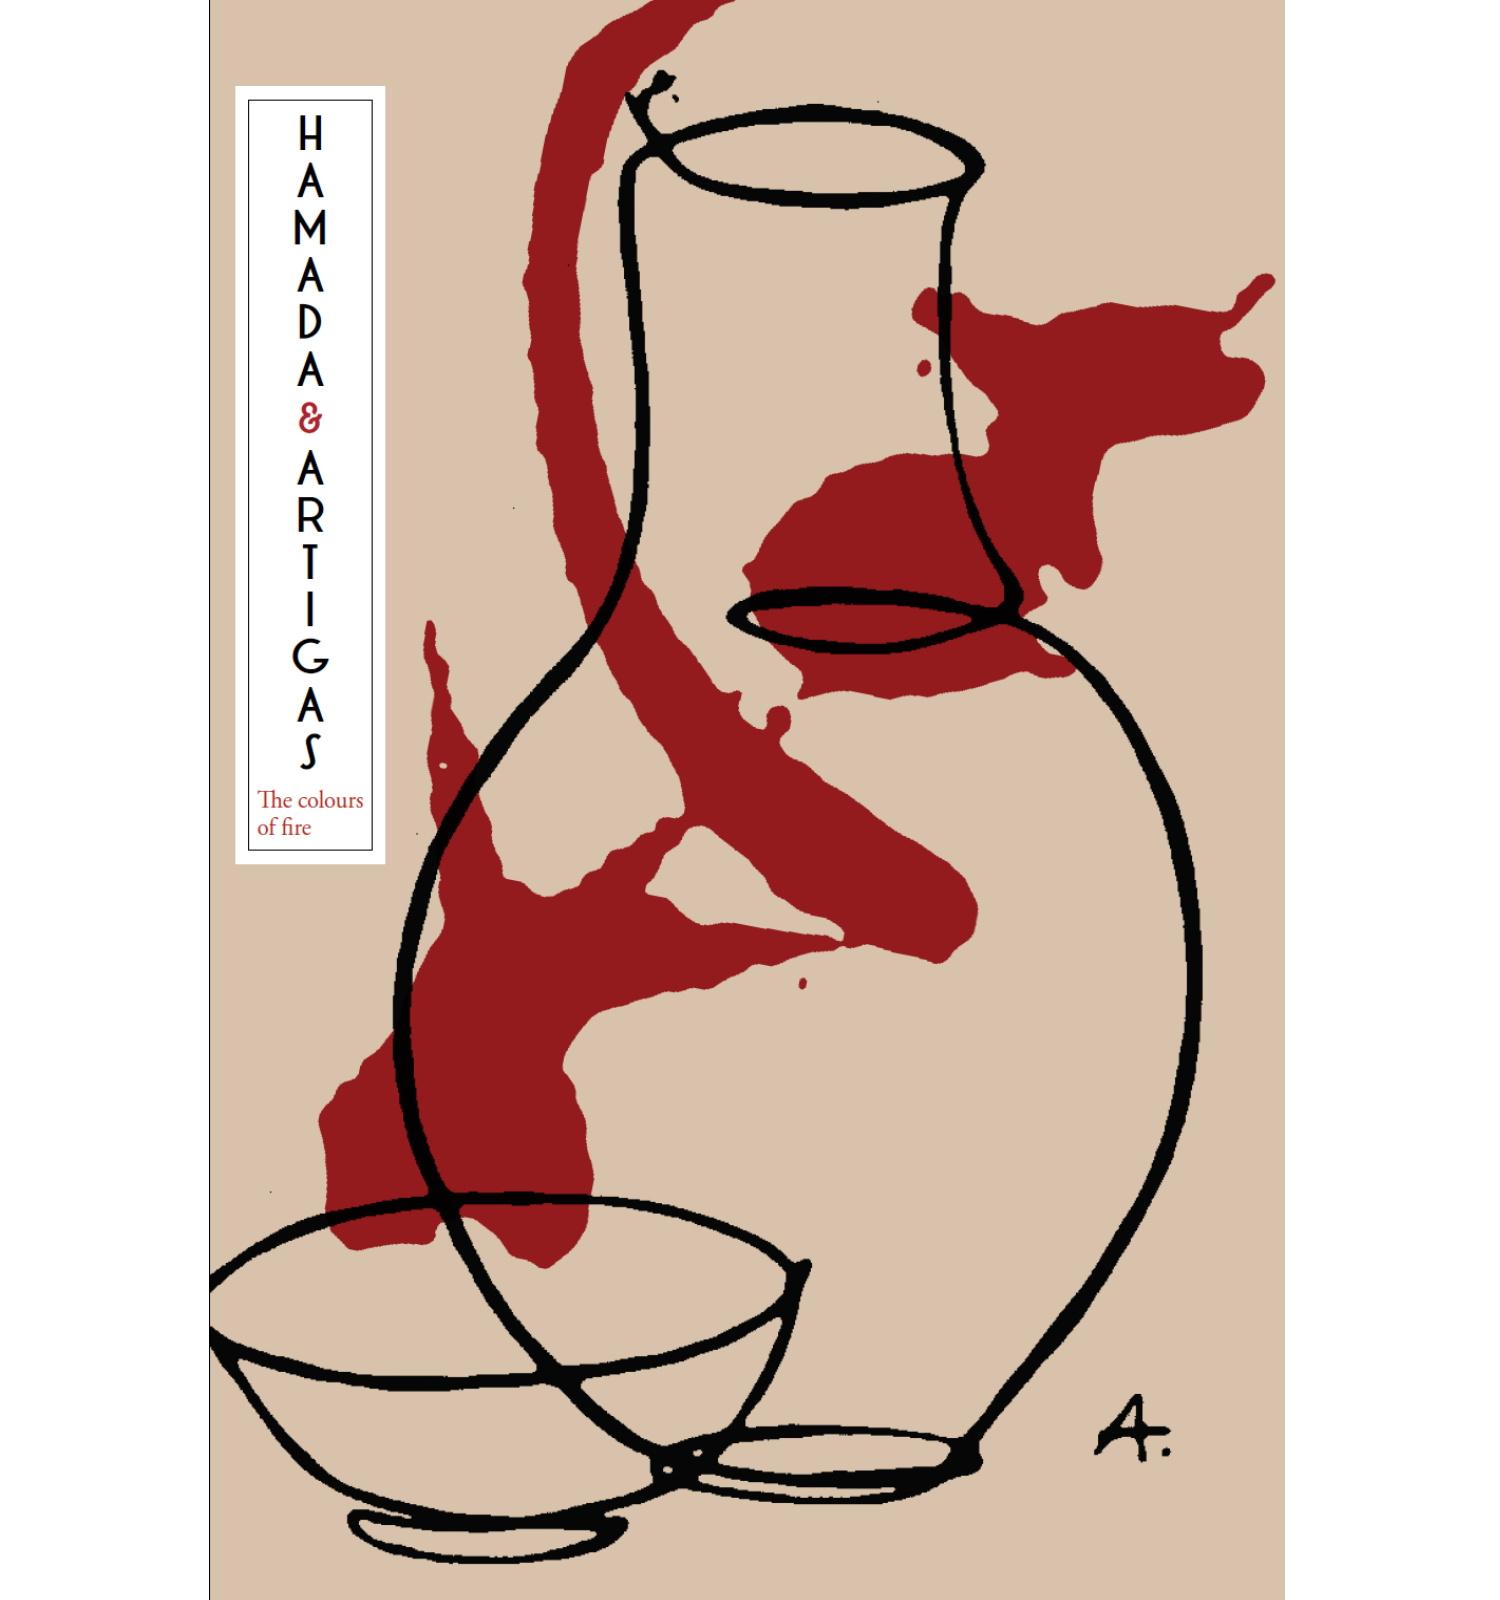 The colours of fire. Hamada - Artigas | Exhibition catalog